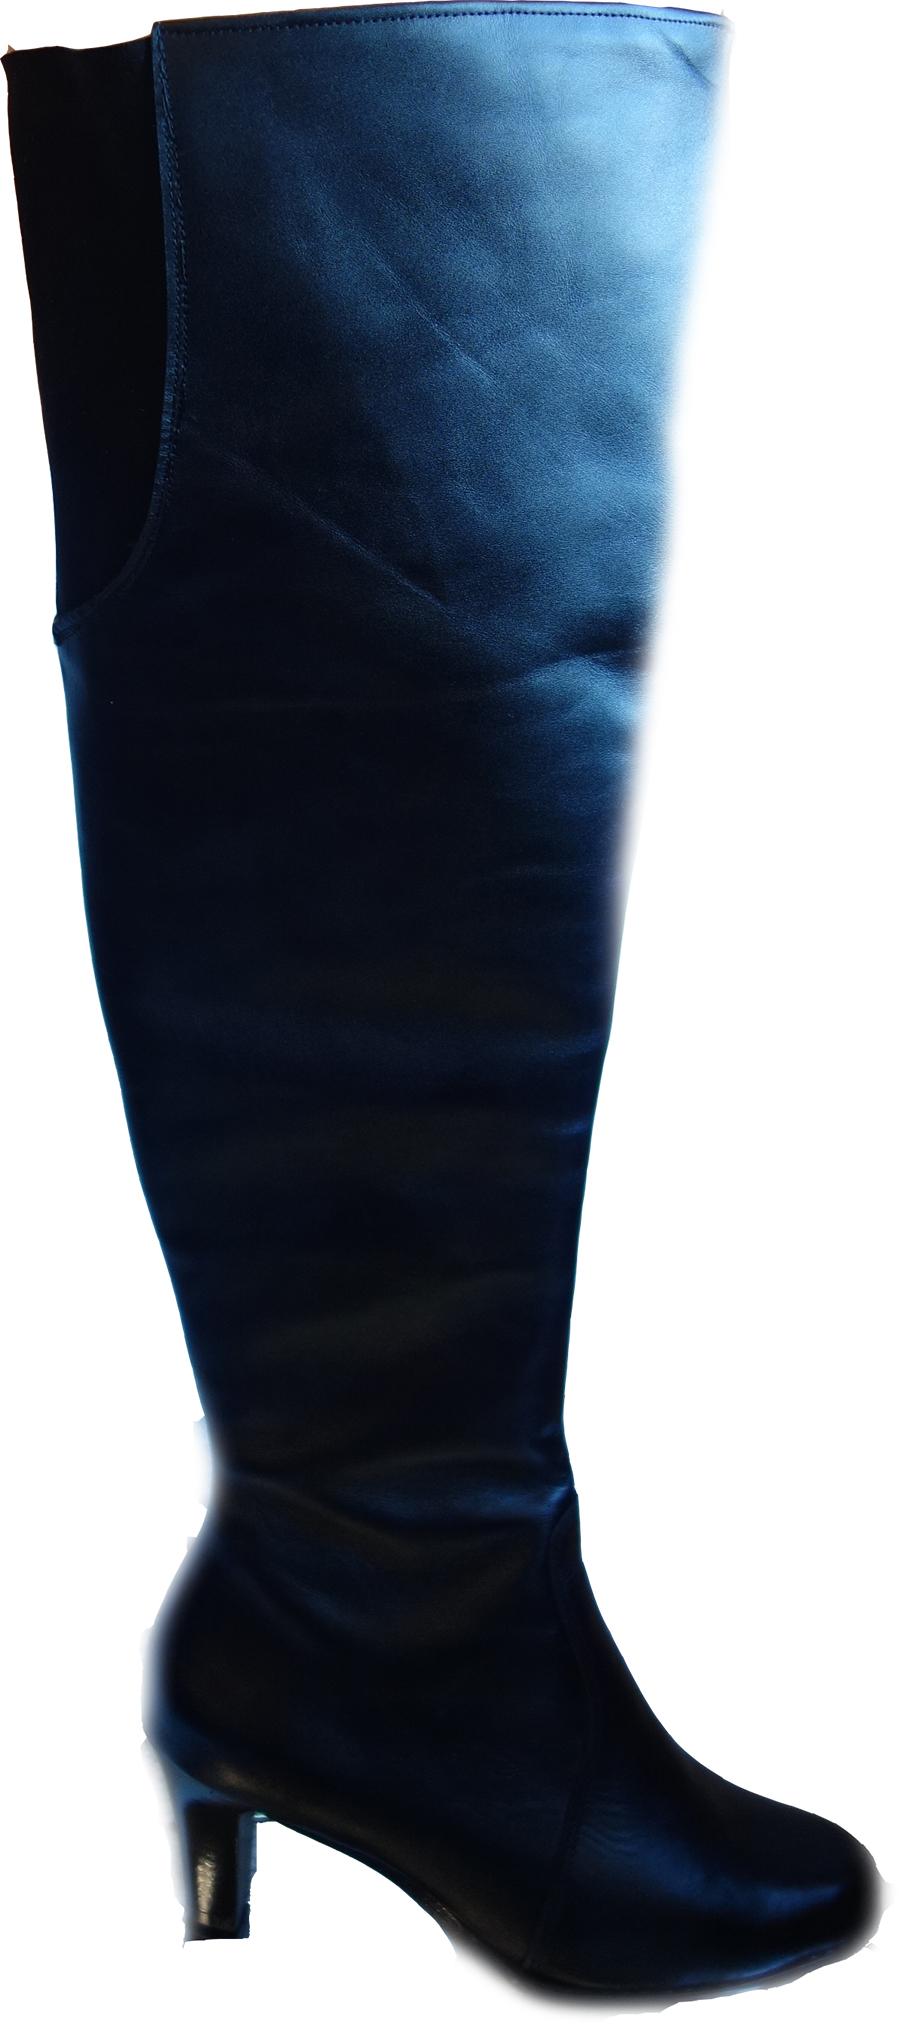 61ae881a0126d 40% skórzane KOZAKI szeroka cholewka aż 42 cm 41 - 7136132235 ...